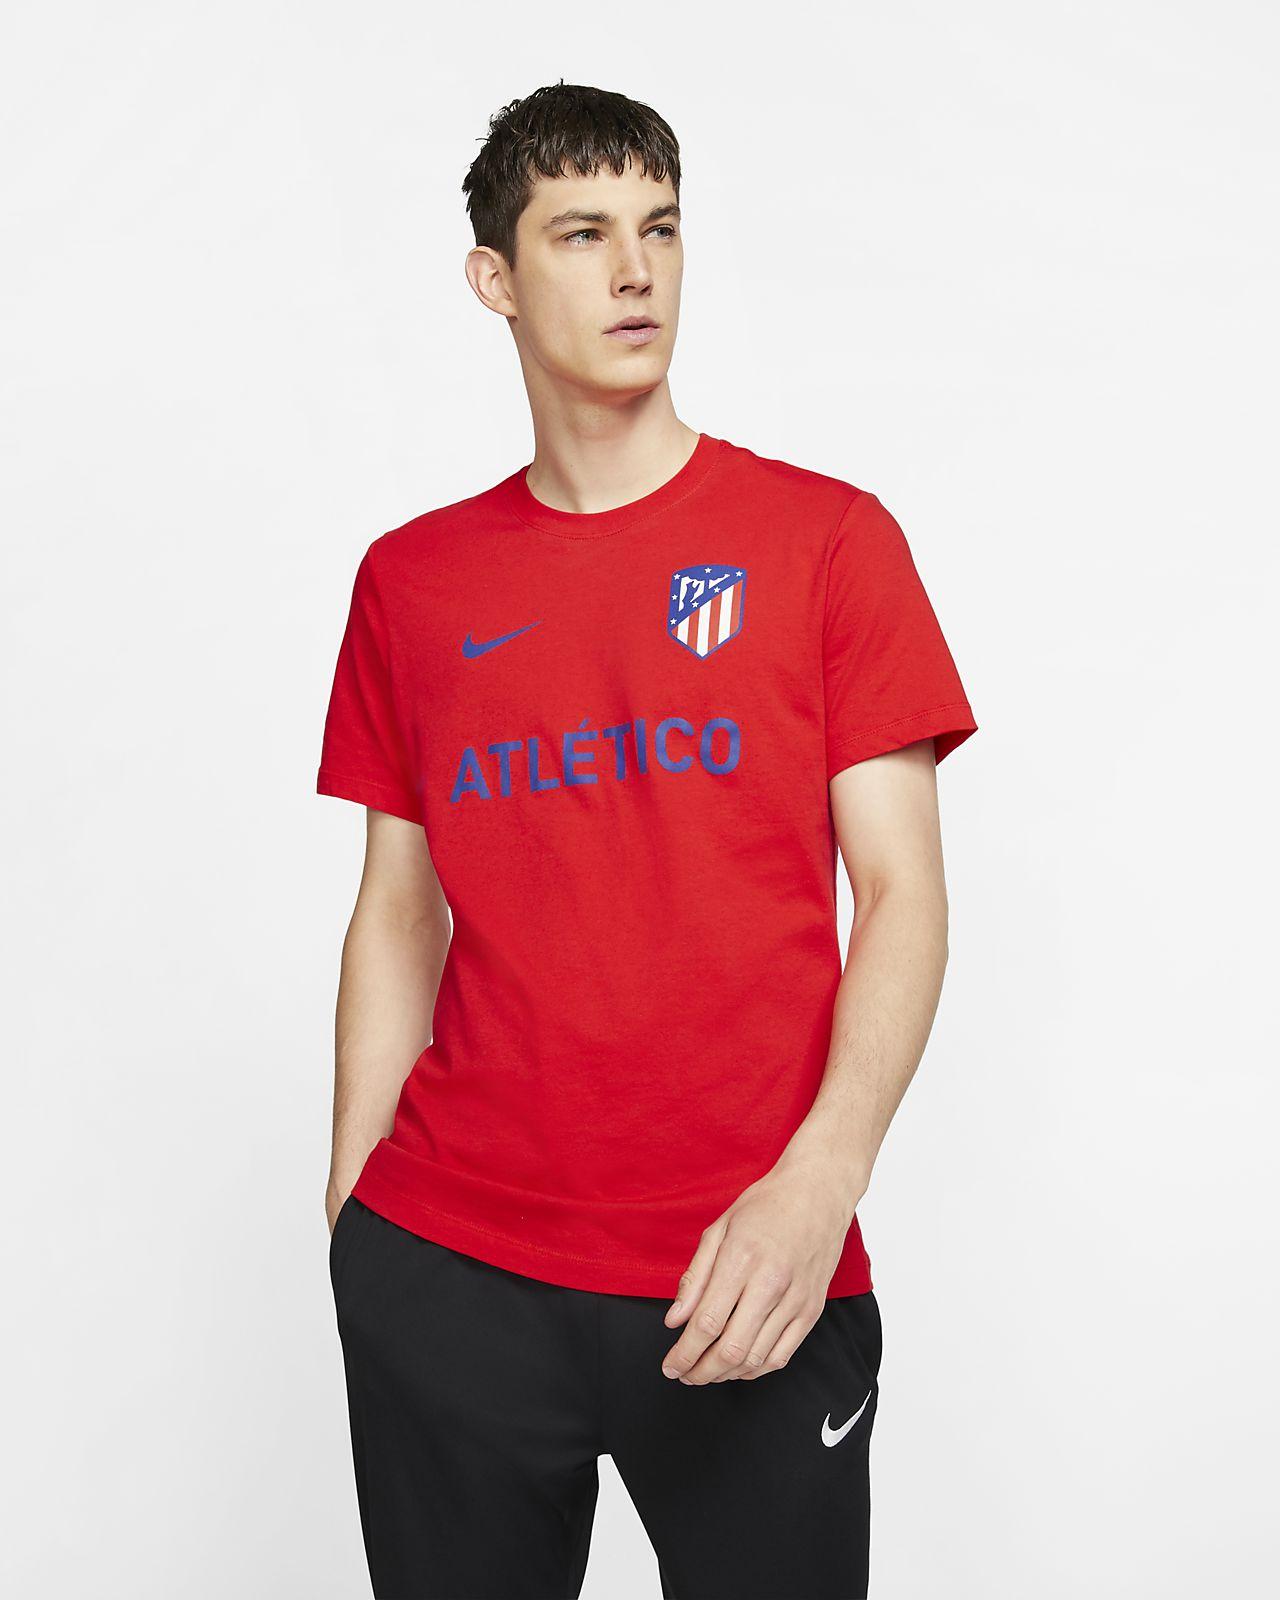 Pánské tričko Atlético de Madrid